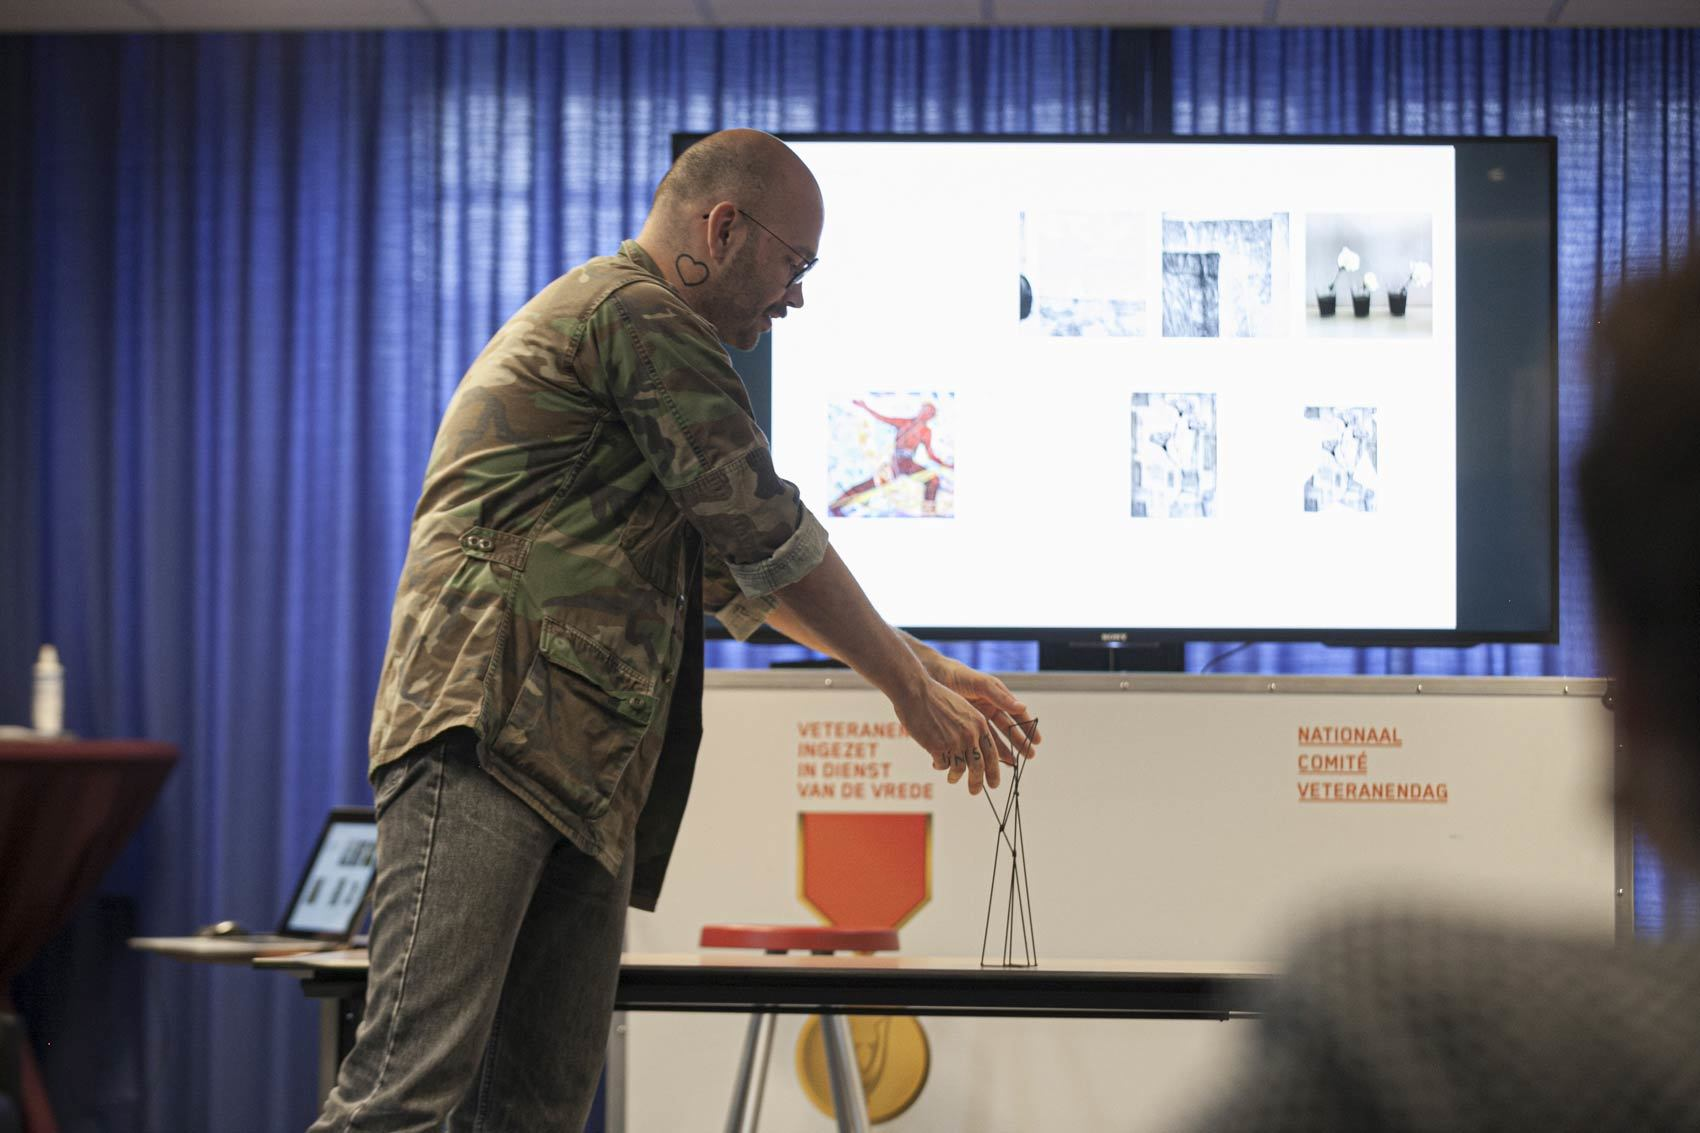 Gabriël Holysz - Witte Anjer Prijs ontwerpconcept 2020